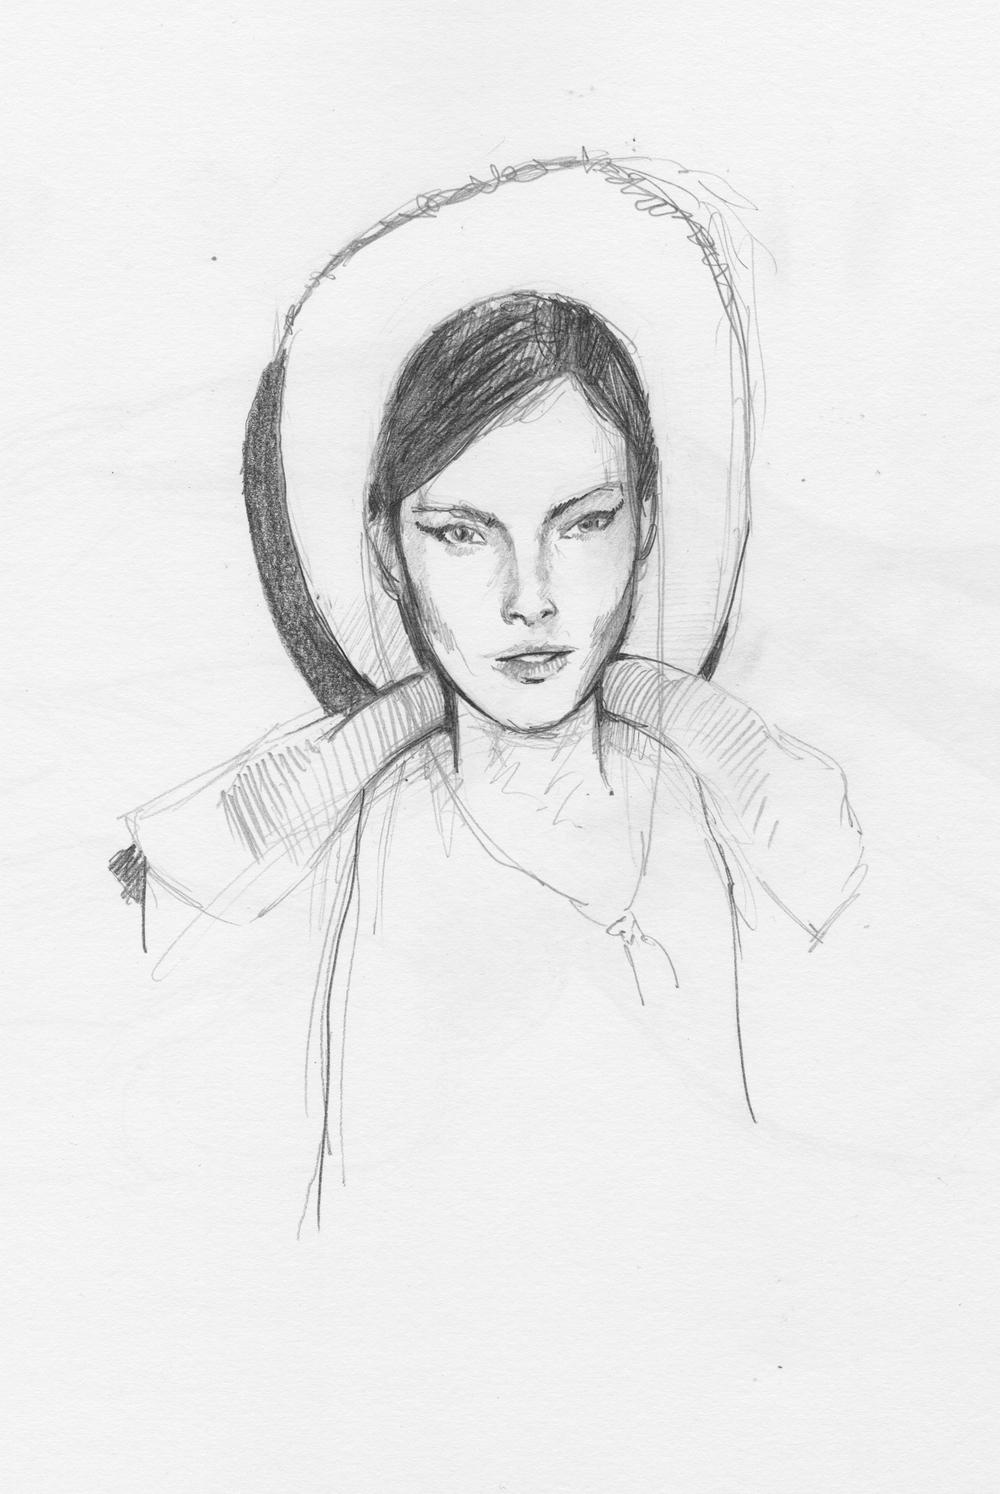 sketch-cowgirl_david-jackowski_alvatron-studio.jpg